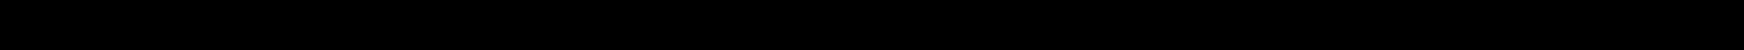 cfsalamisrev-webfont.ttf